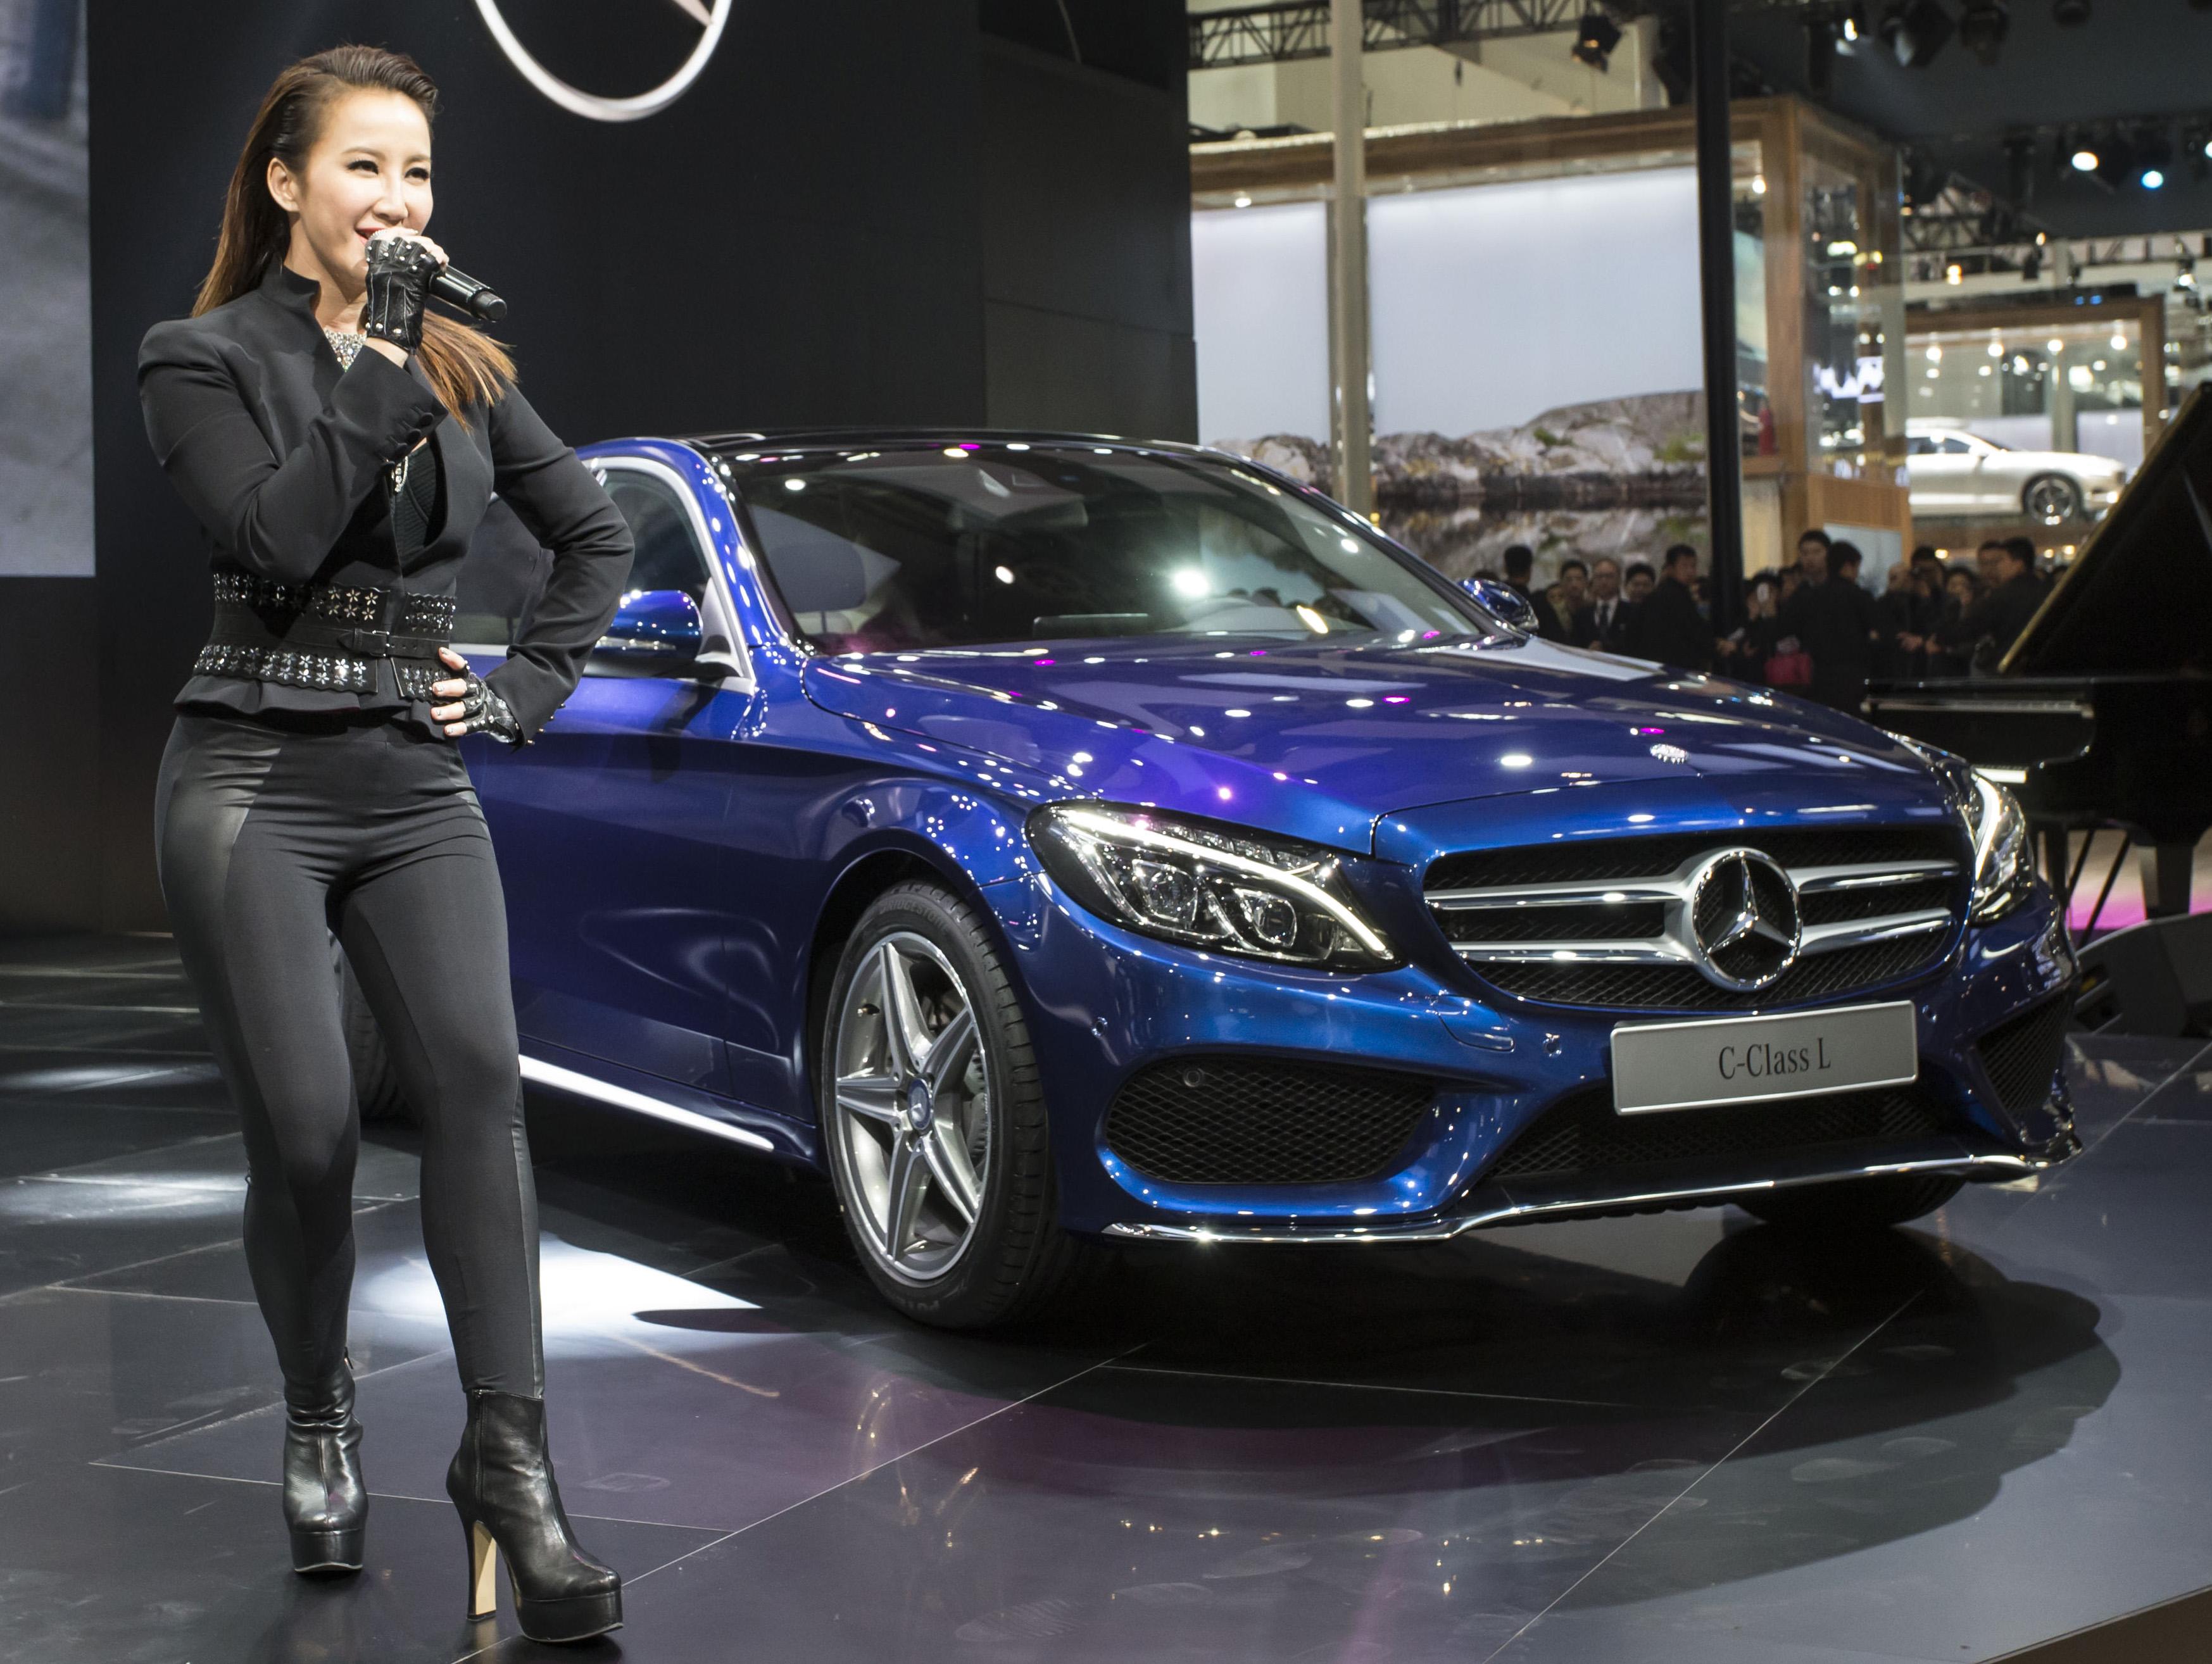 Back to Story: Mercedes-Benz C-Class L – a long-wheelbase W205